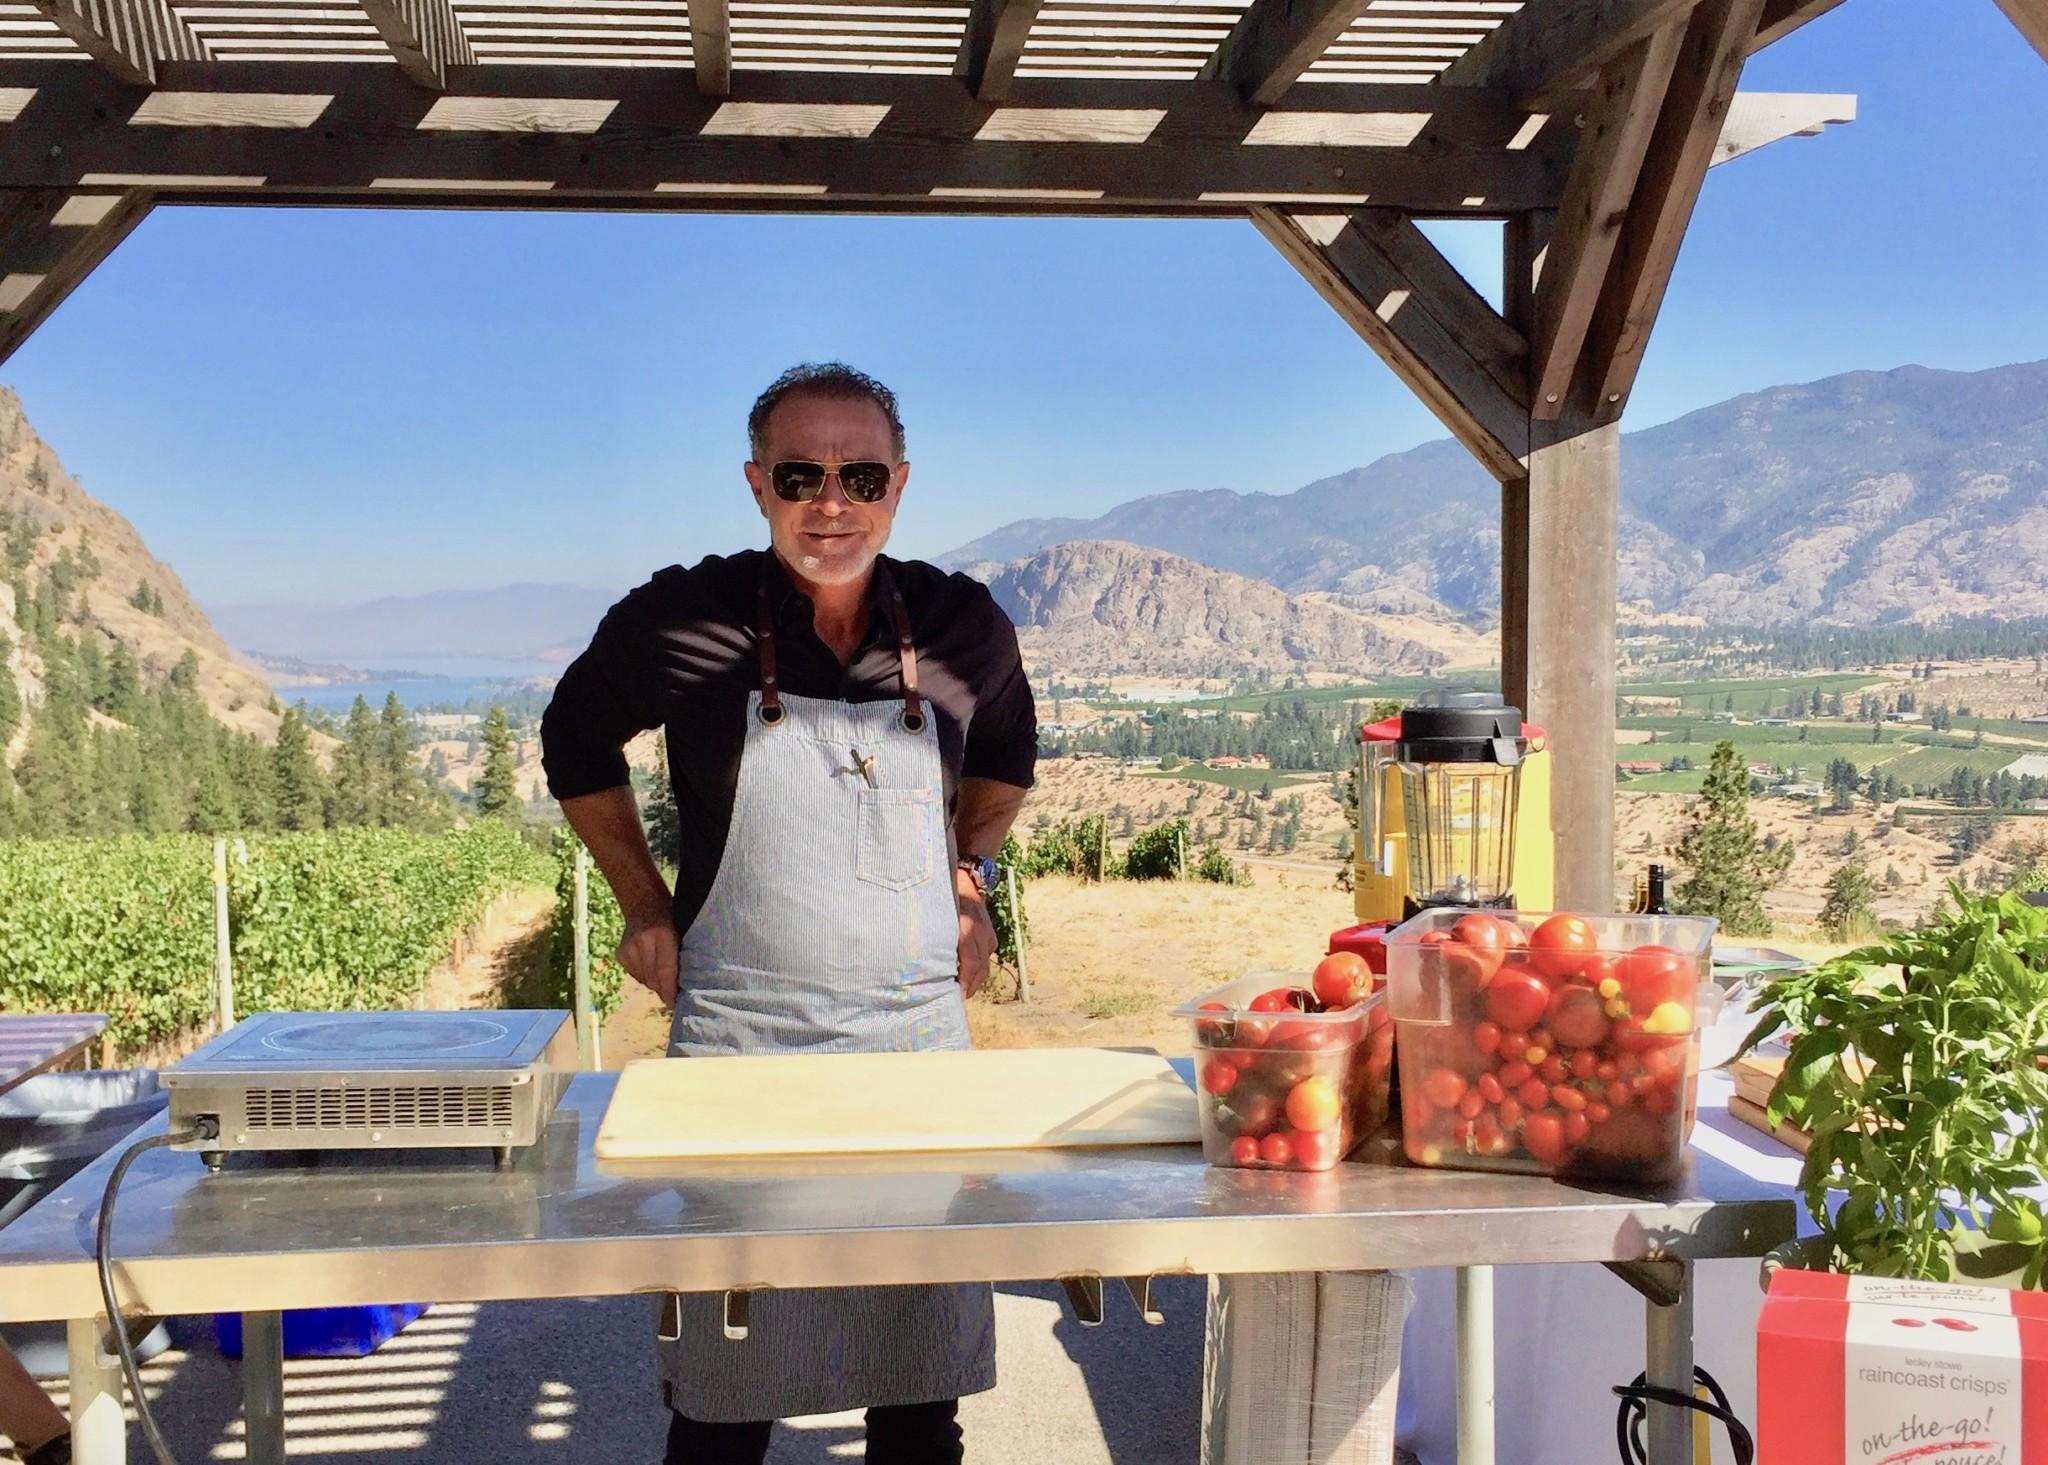 #TasteofThursday Chef meets BC Grape Okanagan – Chef Mark McEwan Ricotta Gnocchi recipe